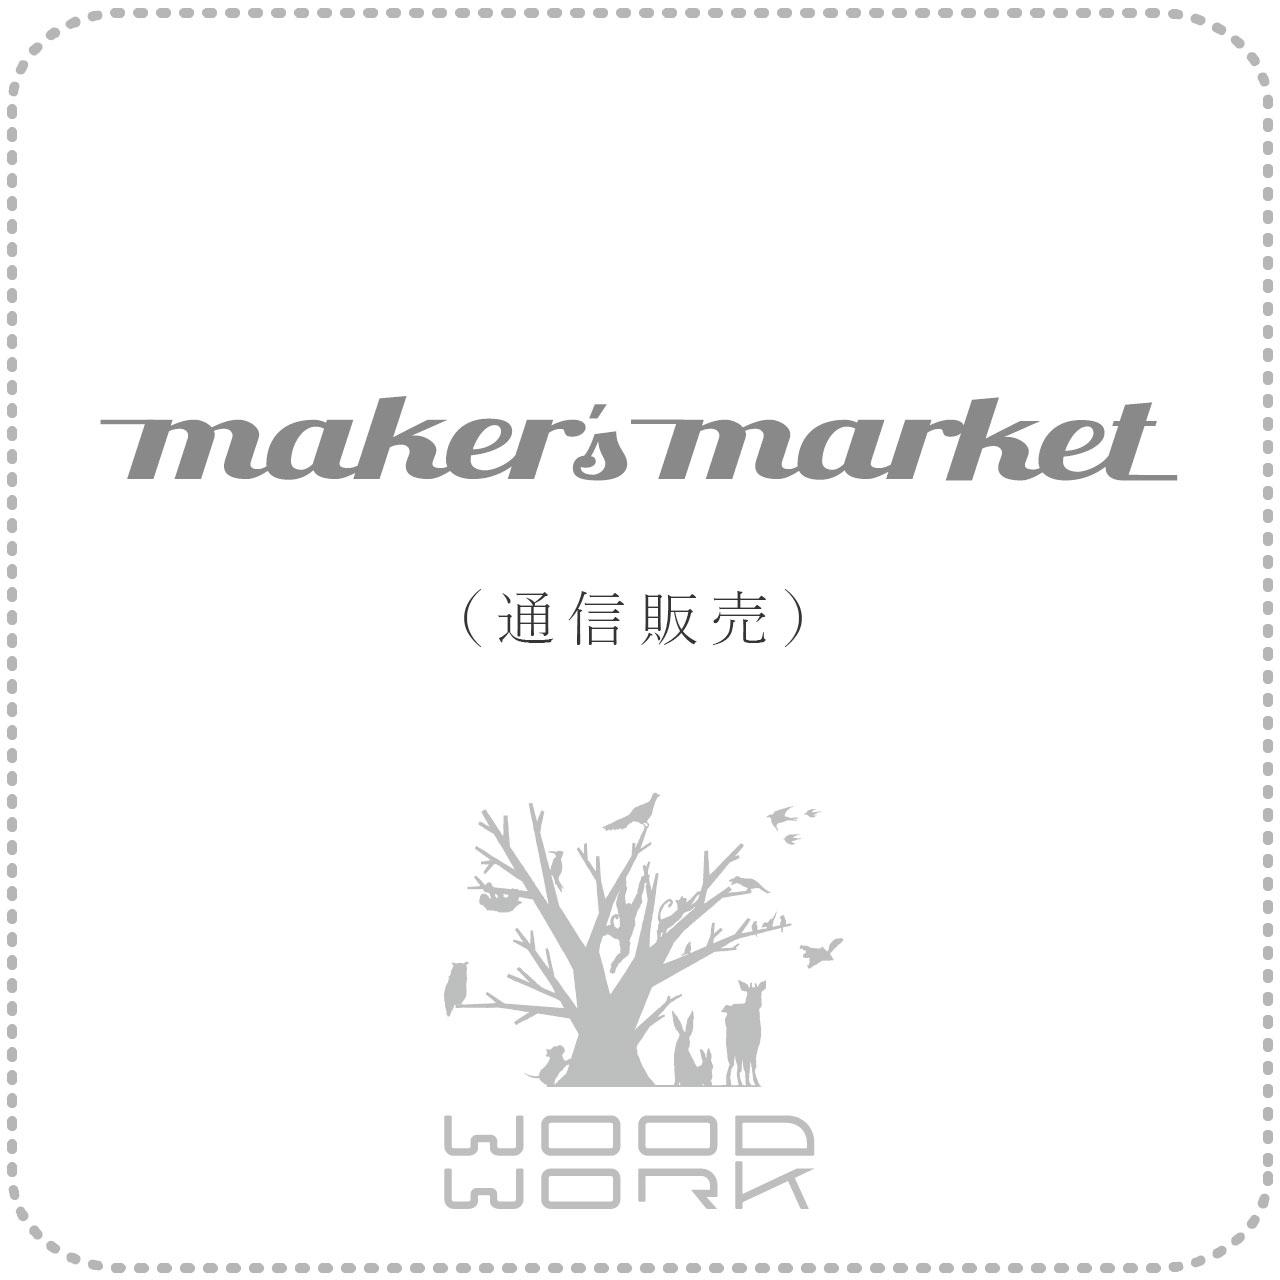 maker's market (通信販売)